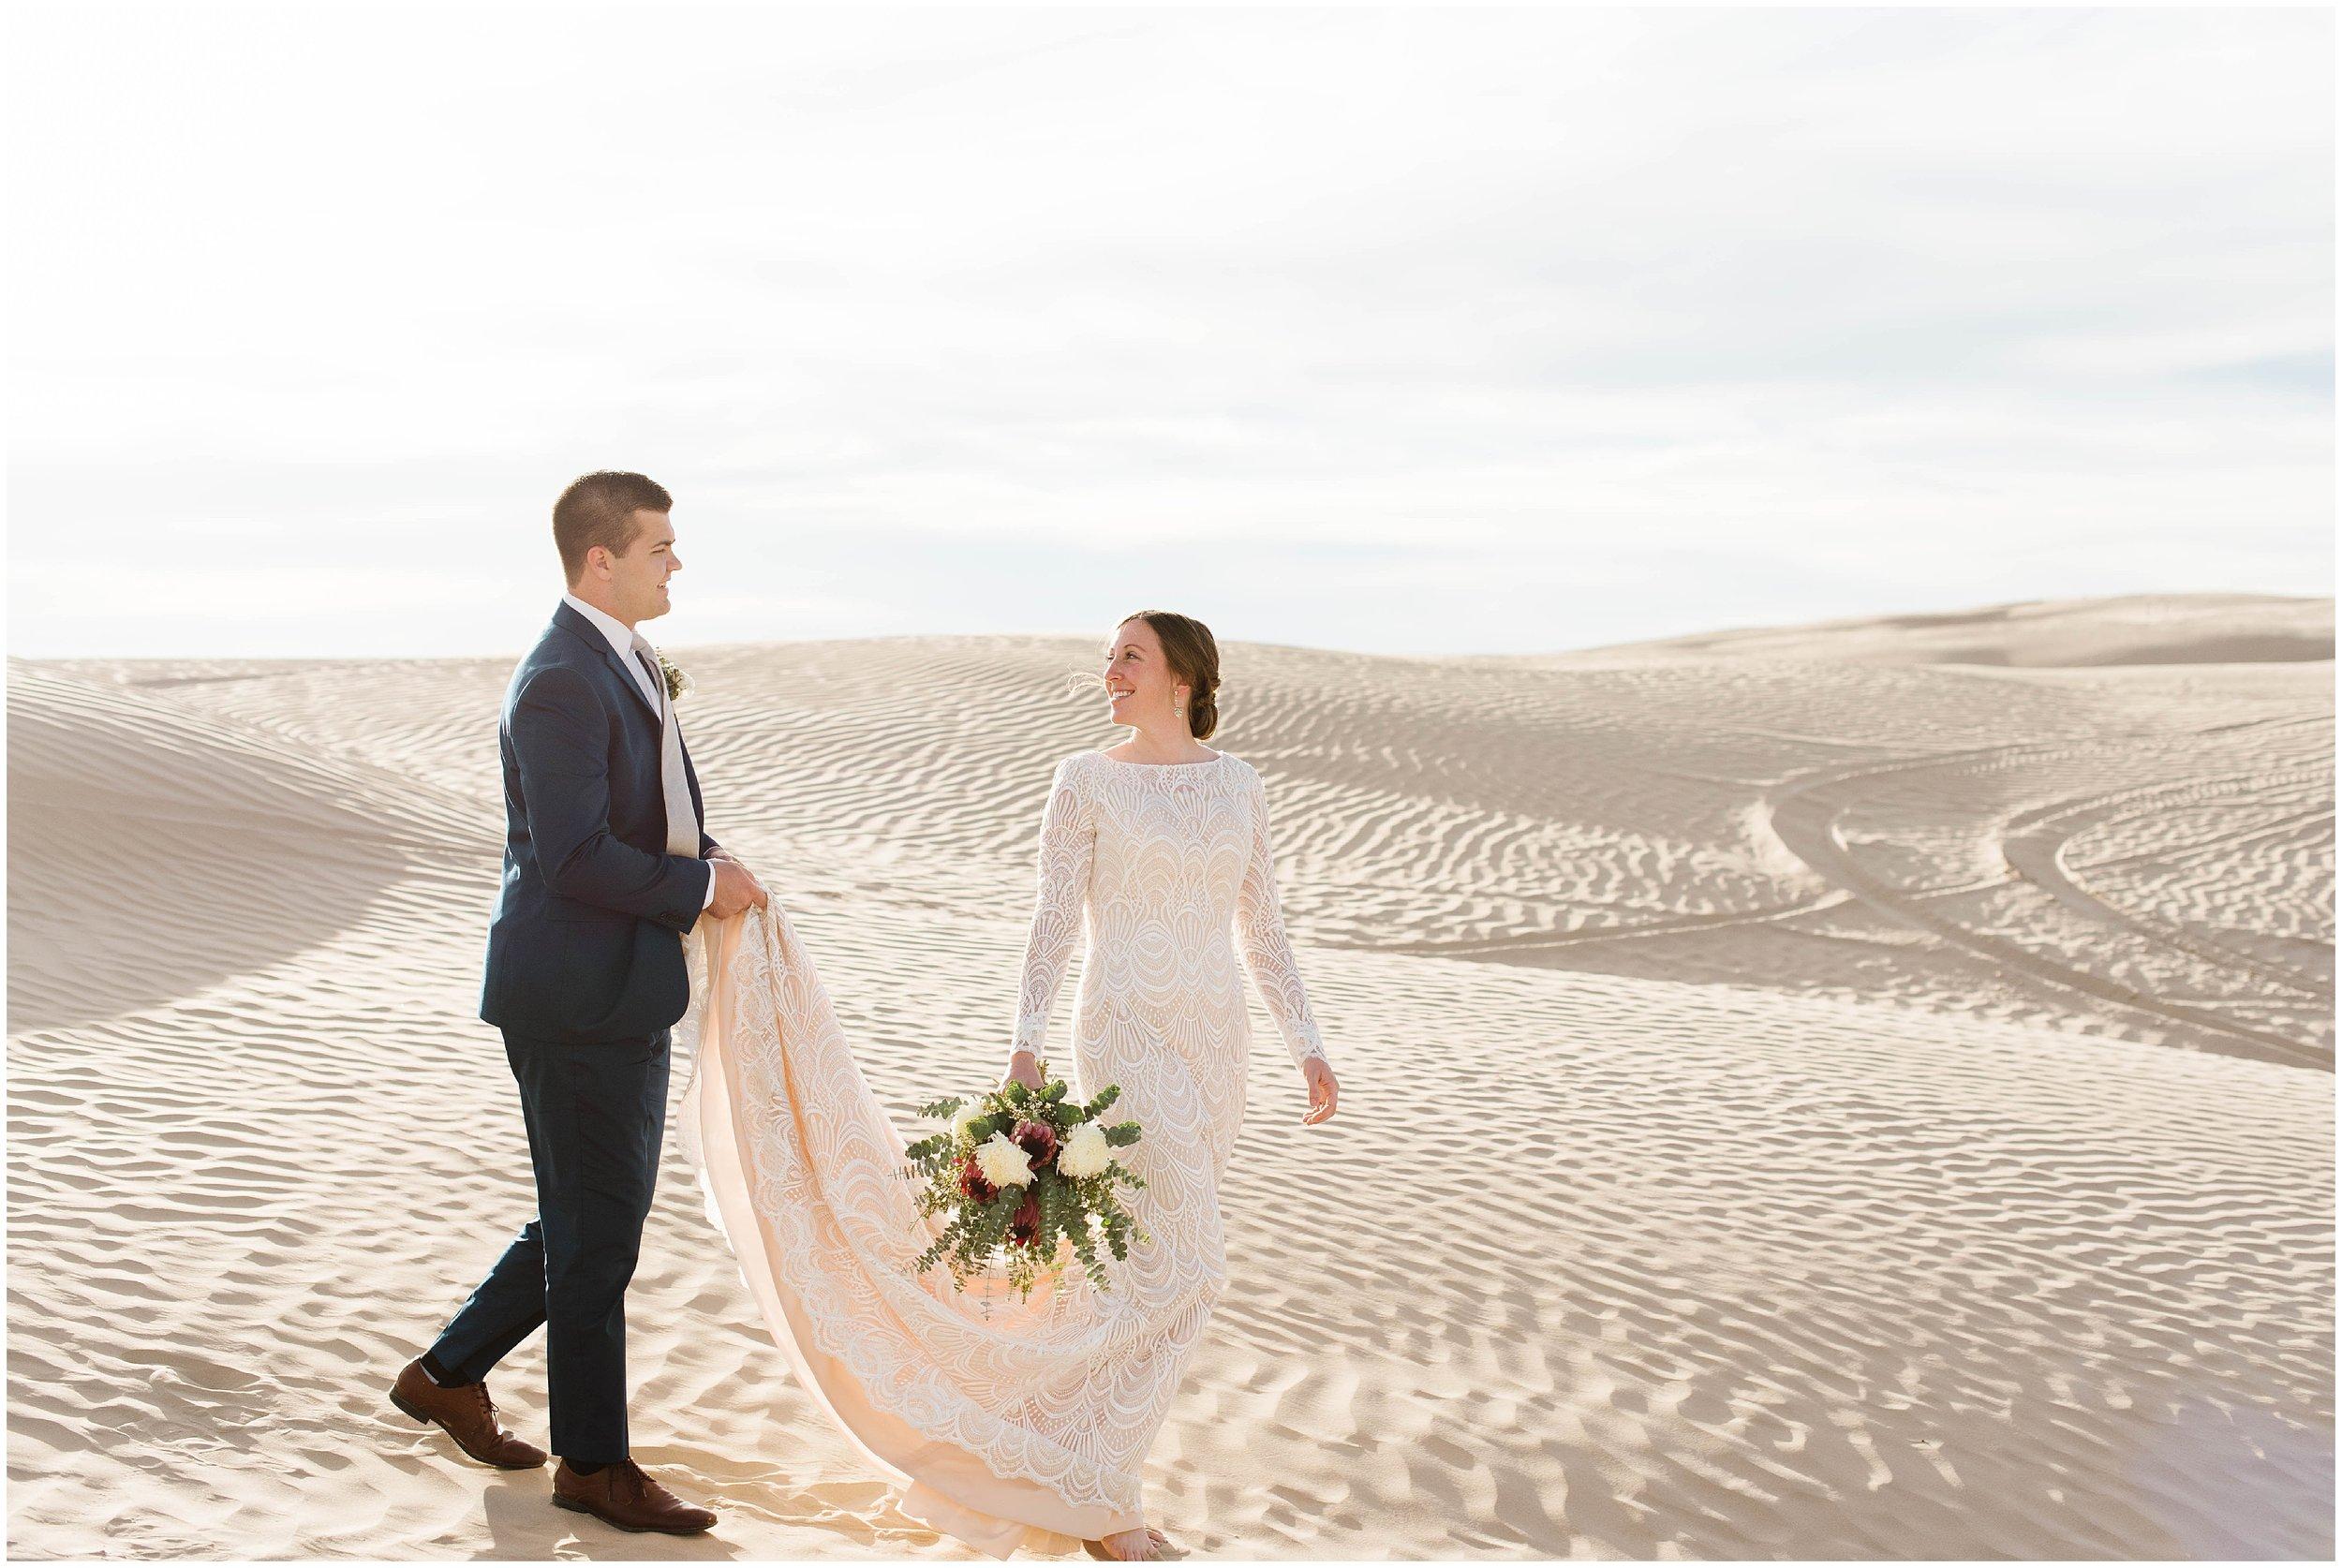 little-sahara-sand-dunes-wedding-amber-lynne-photography.jpg18.jpg